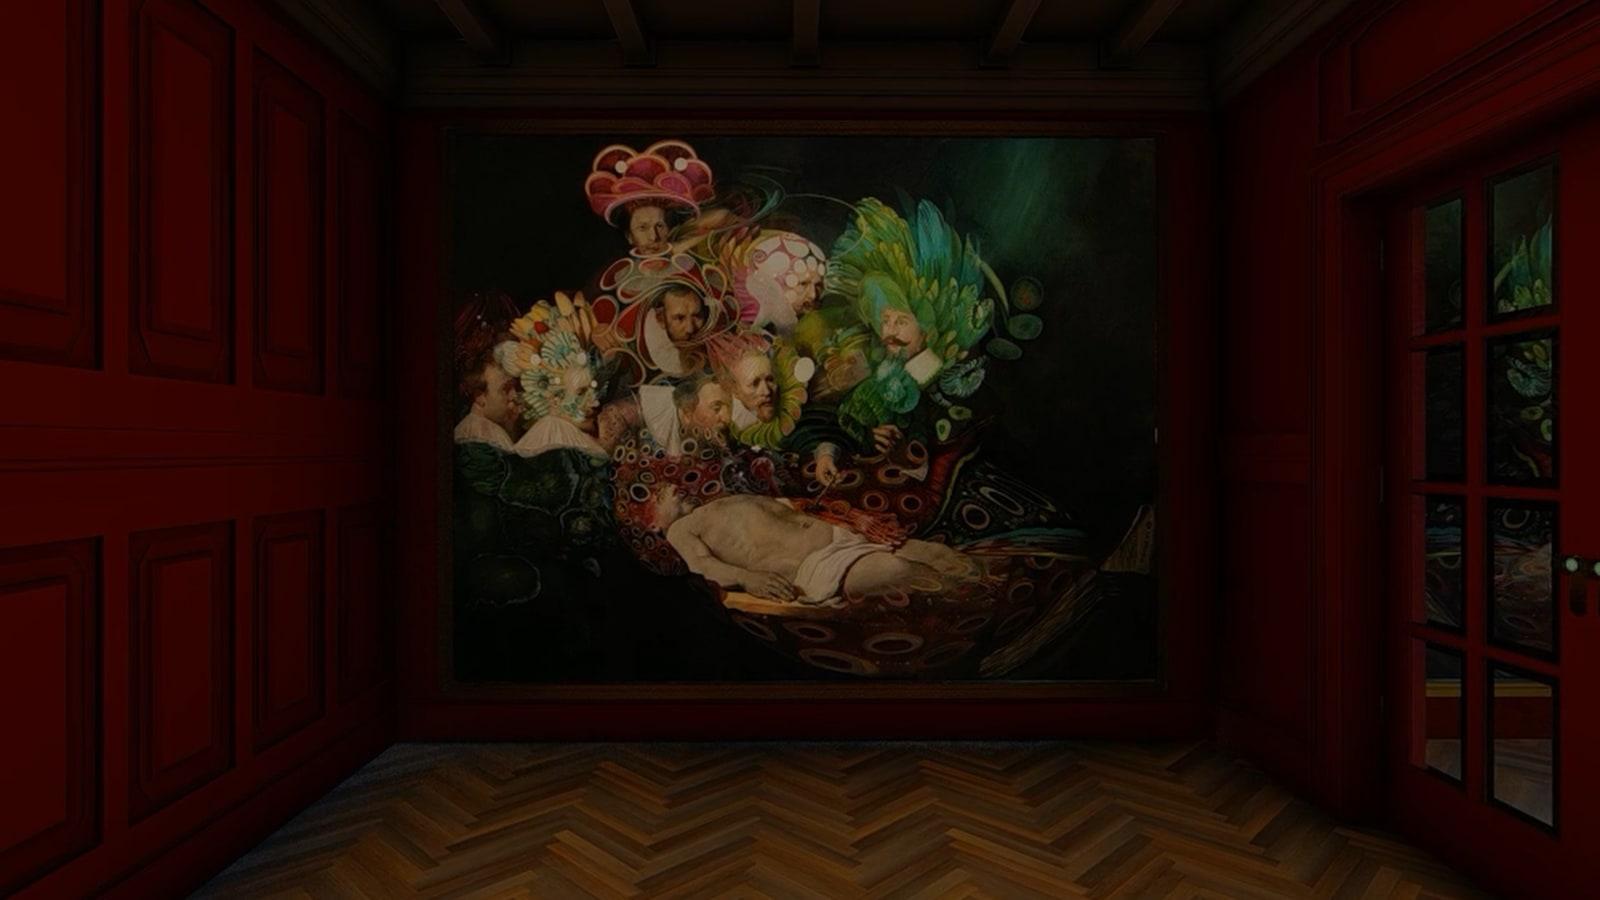 WOLFE VON LENKIEWICZ The Anatomy Lesson of Dr Tulp, 2018 220 x 170 cm